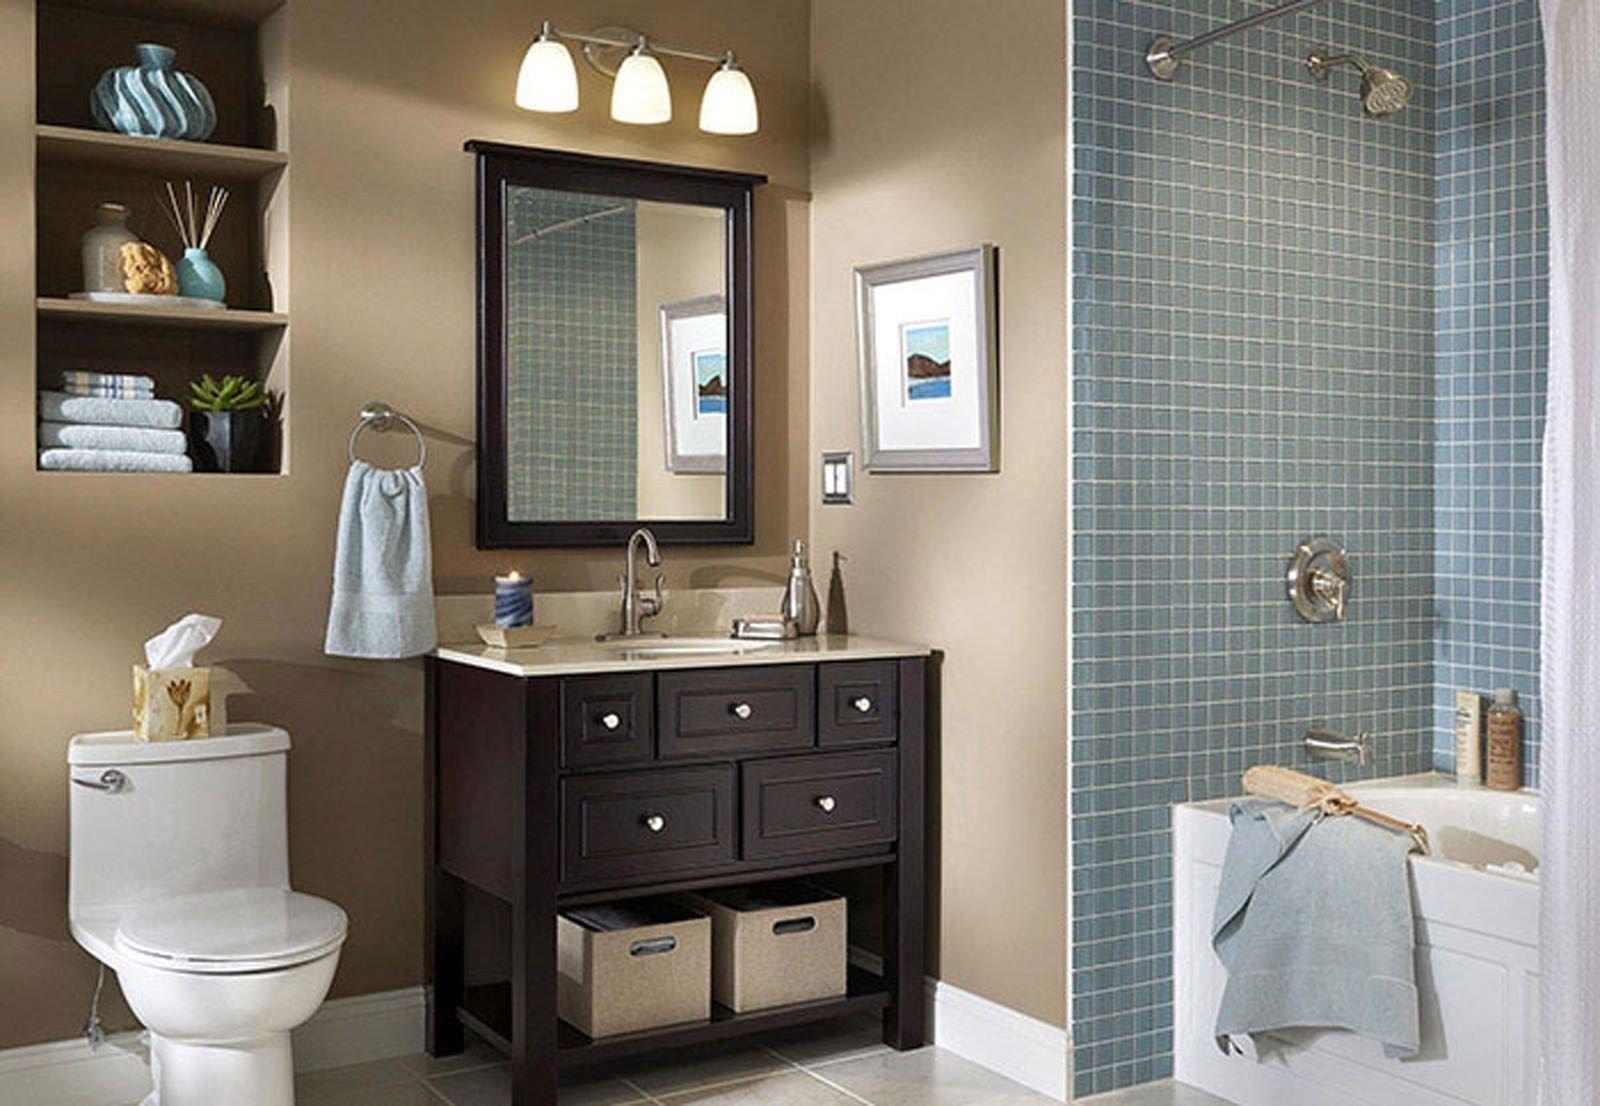 10 Unique Color Ideas For Small Bathrooms top 25 bathroom wall colors ideas 2017 2018 small bathroom